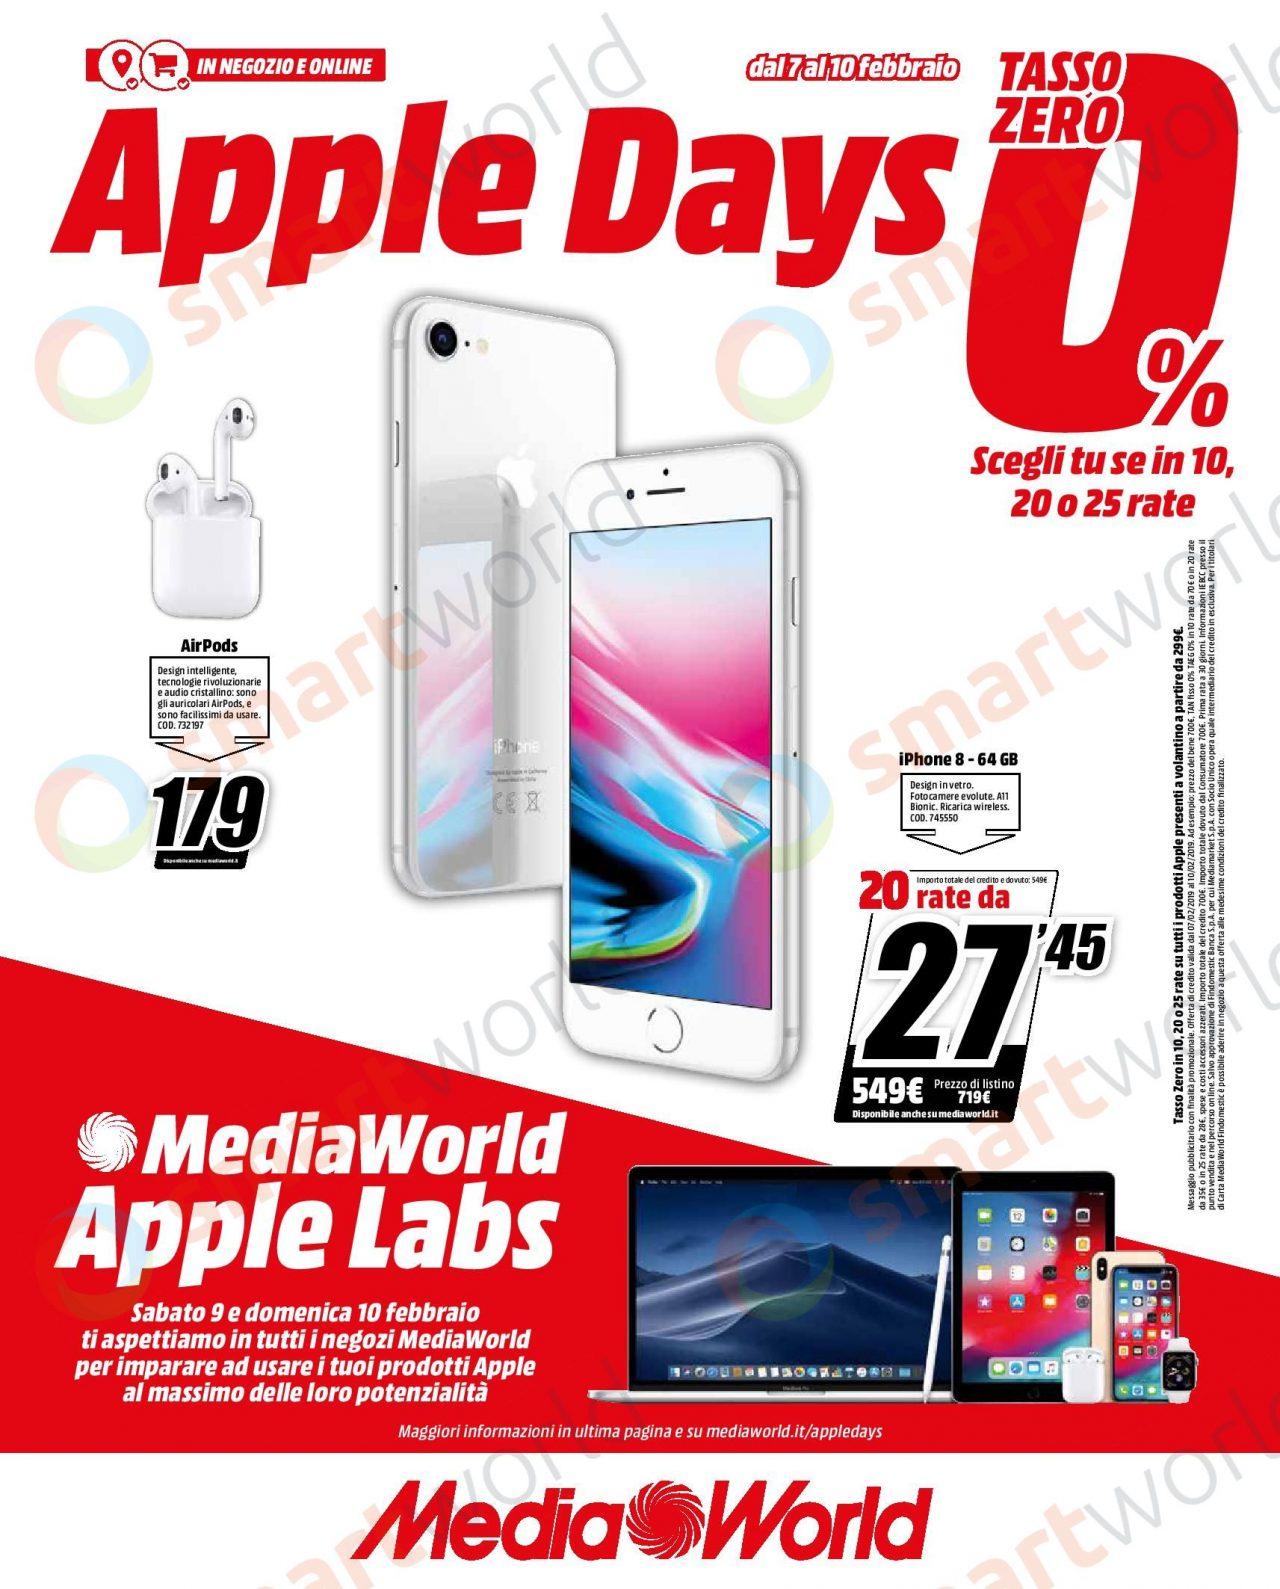 Volantino Mediaworld Apple Days 7 10 Febbraio Iphone Ipad Airpods